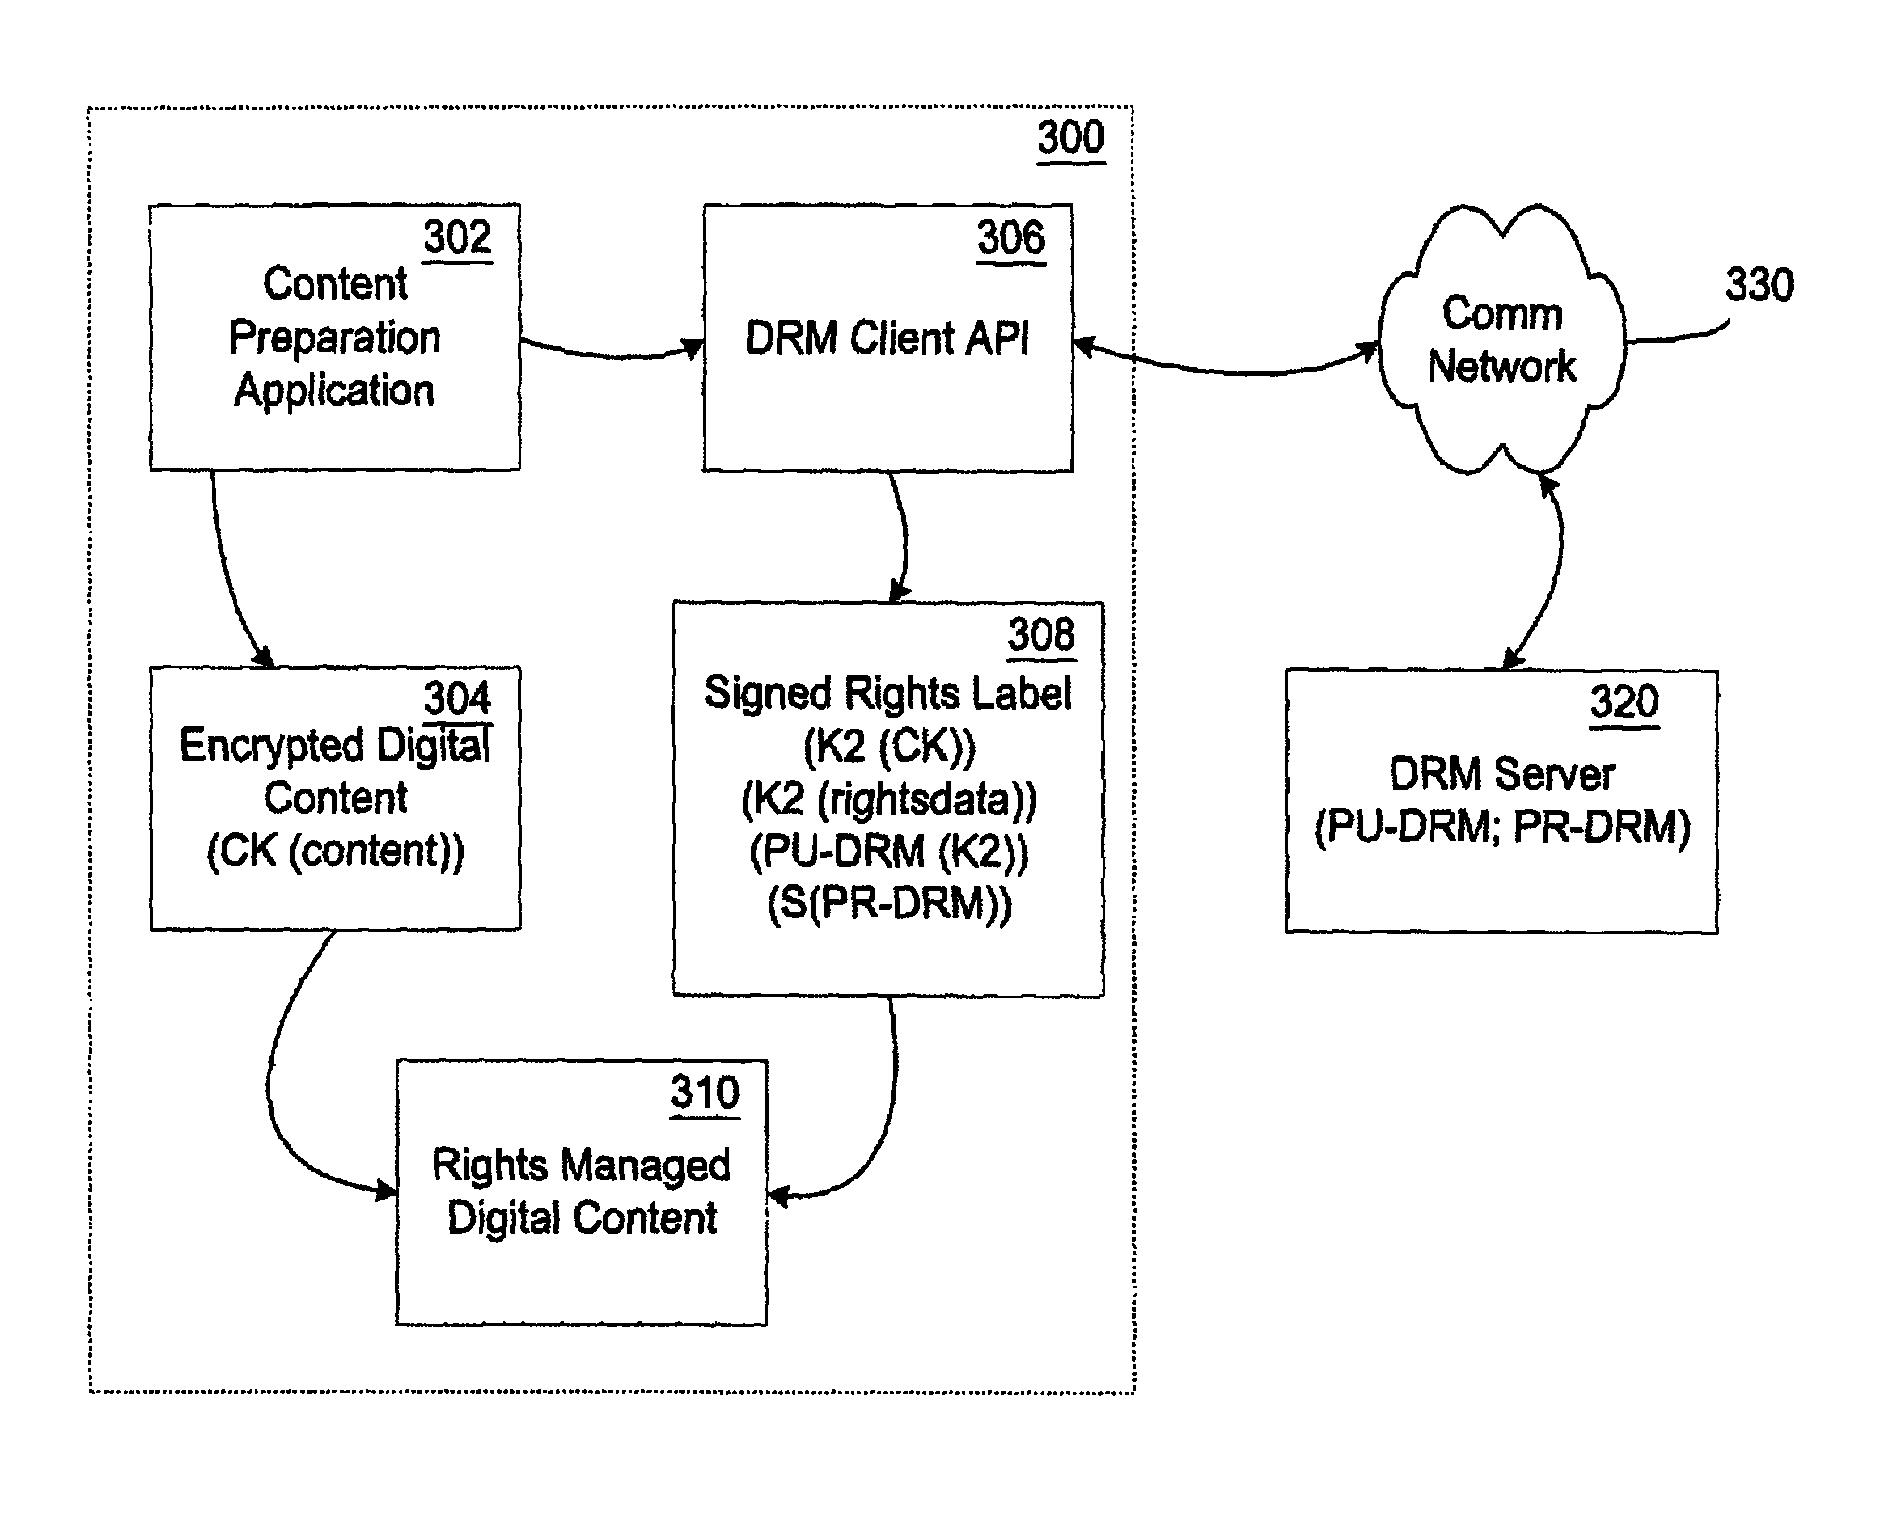 Patent US 8,700,535 B2